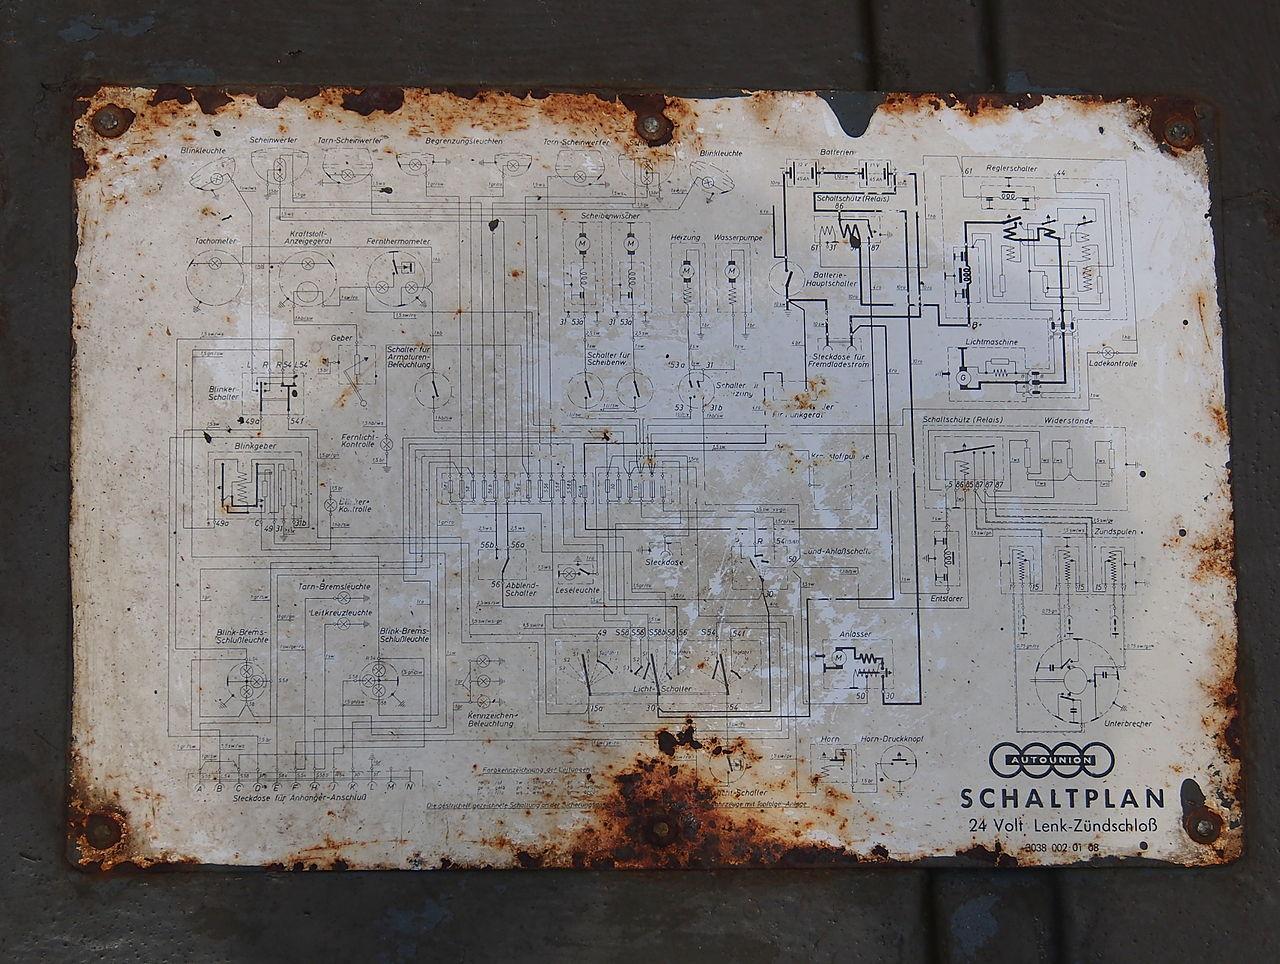 File:1977 Military Auto Union Munga schaltplan, pic7.JPG - Wikimedia ...